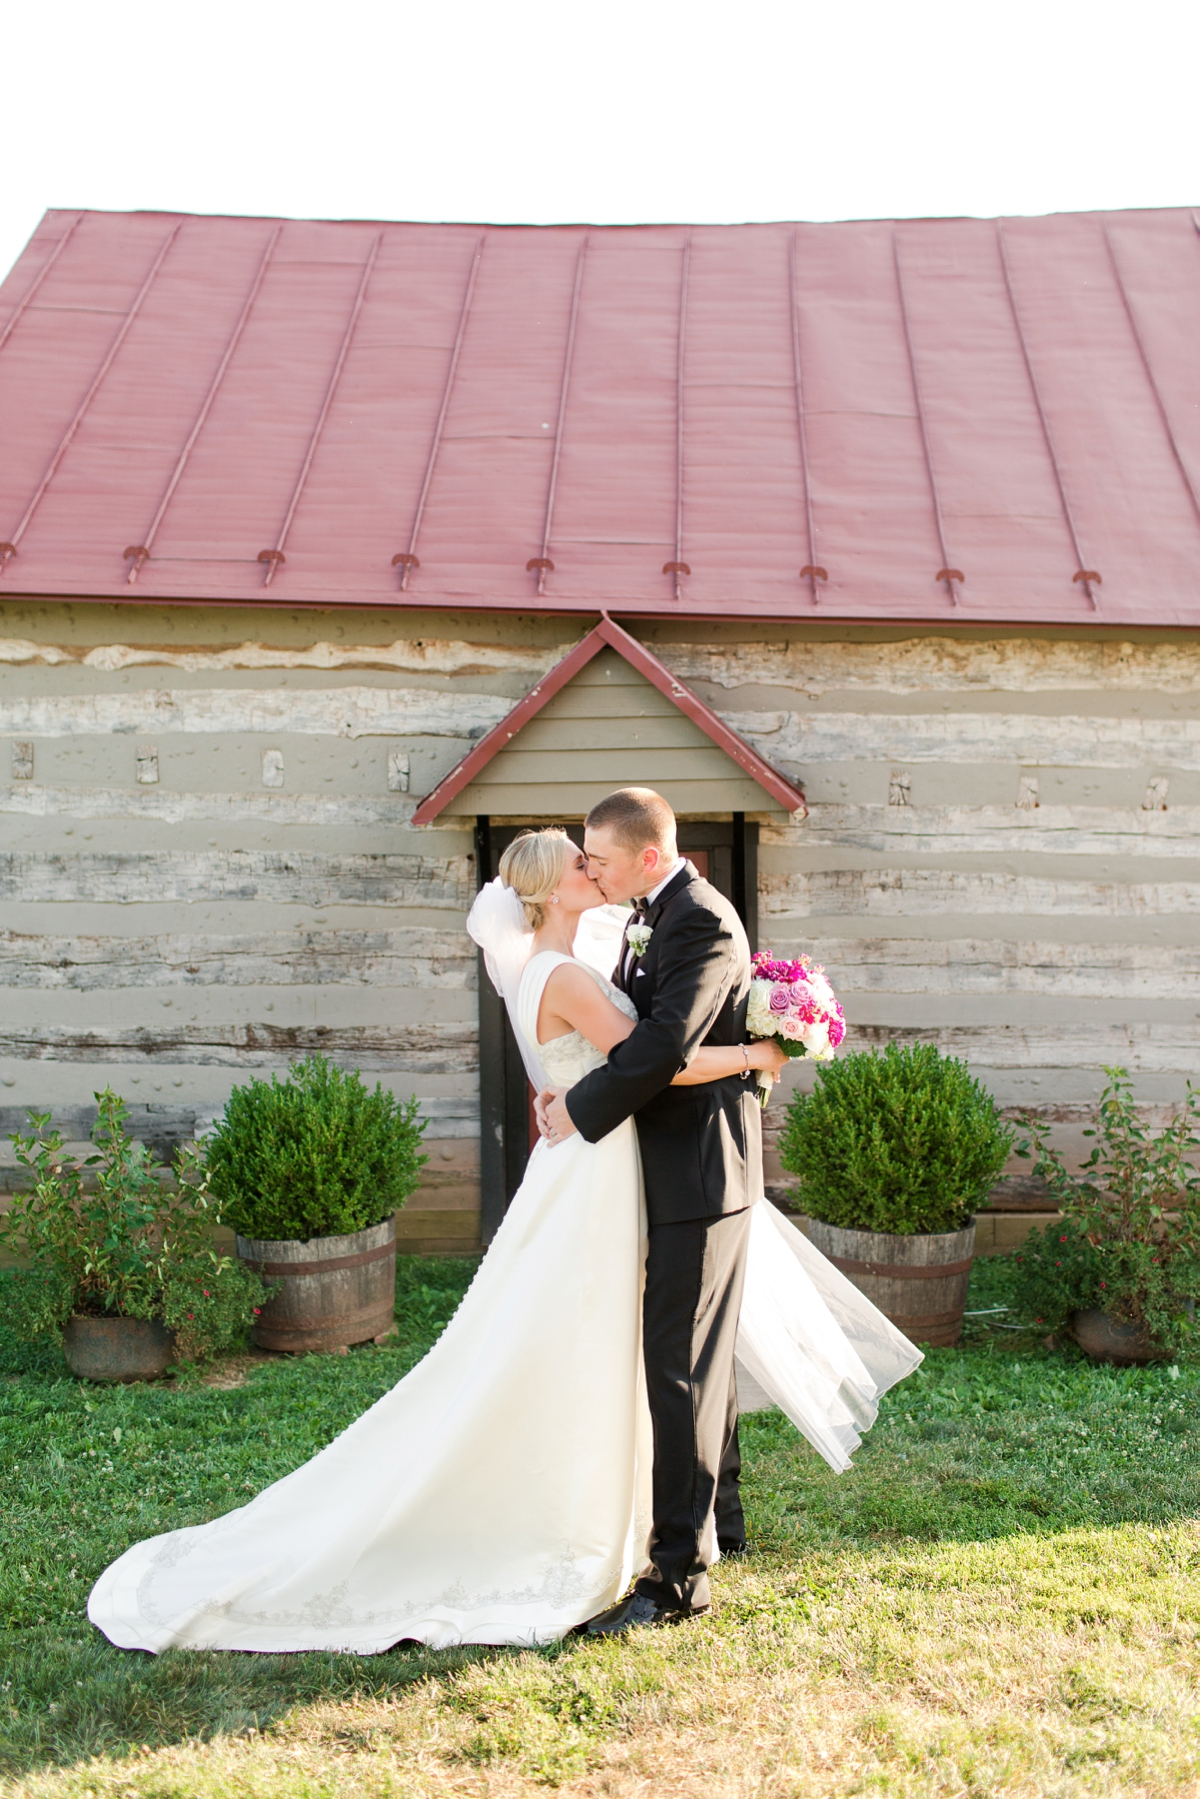 Riverside On the Potomac Barn Wedding Photos. DC Barn Wedding. DC Farm Wedding. Outdoor Ceremony, Indoor Reception.